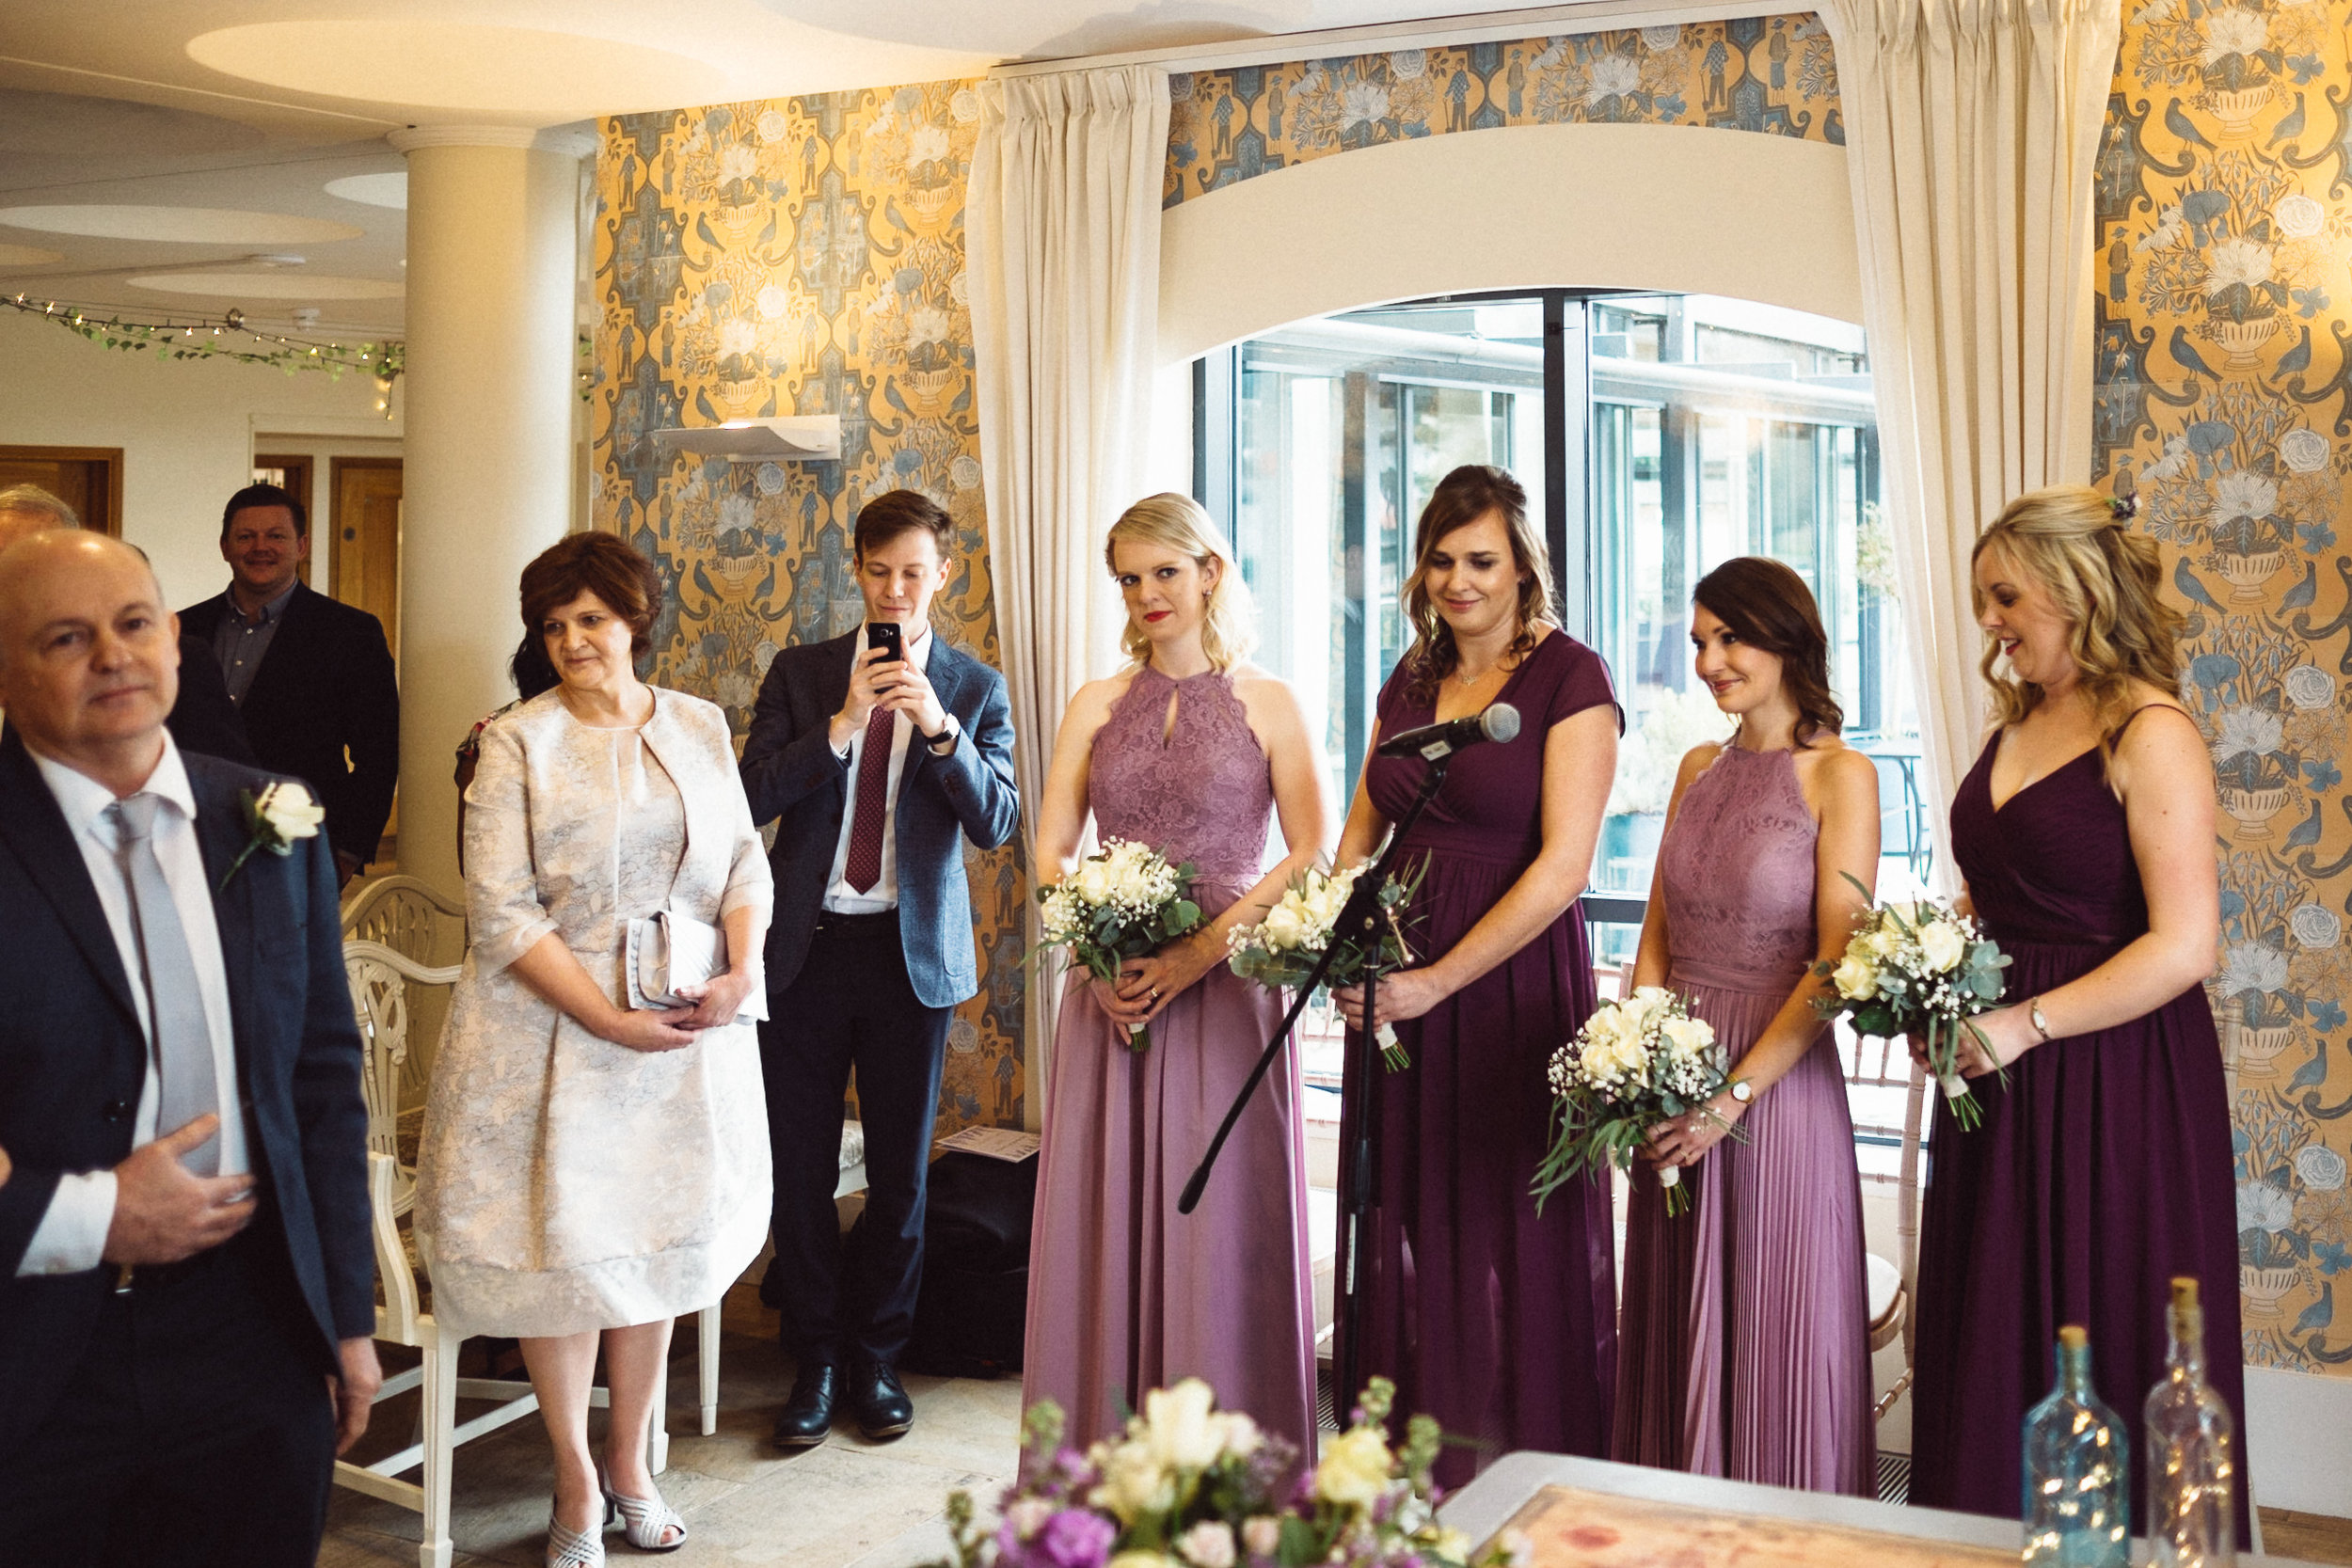 Hereford_wedding_photographer35.jpg